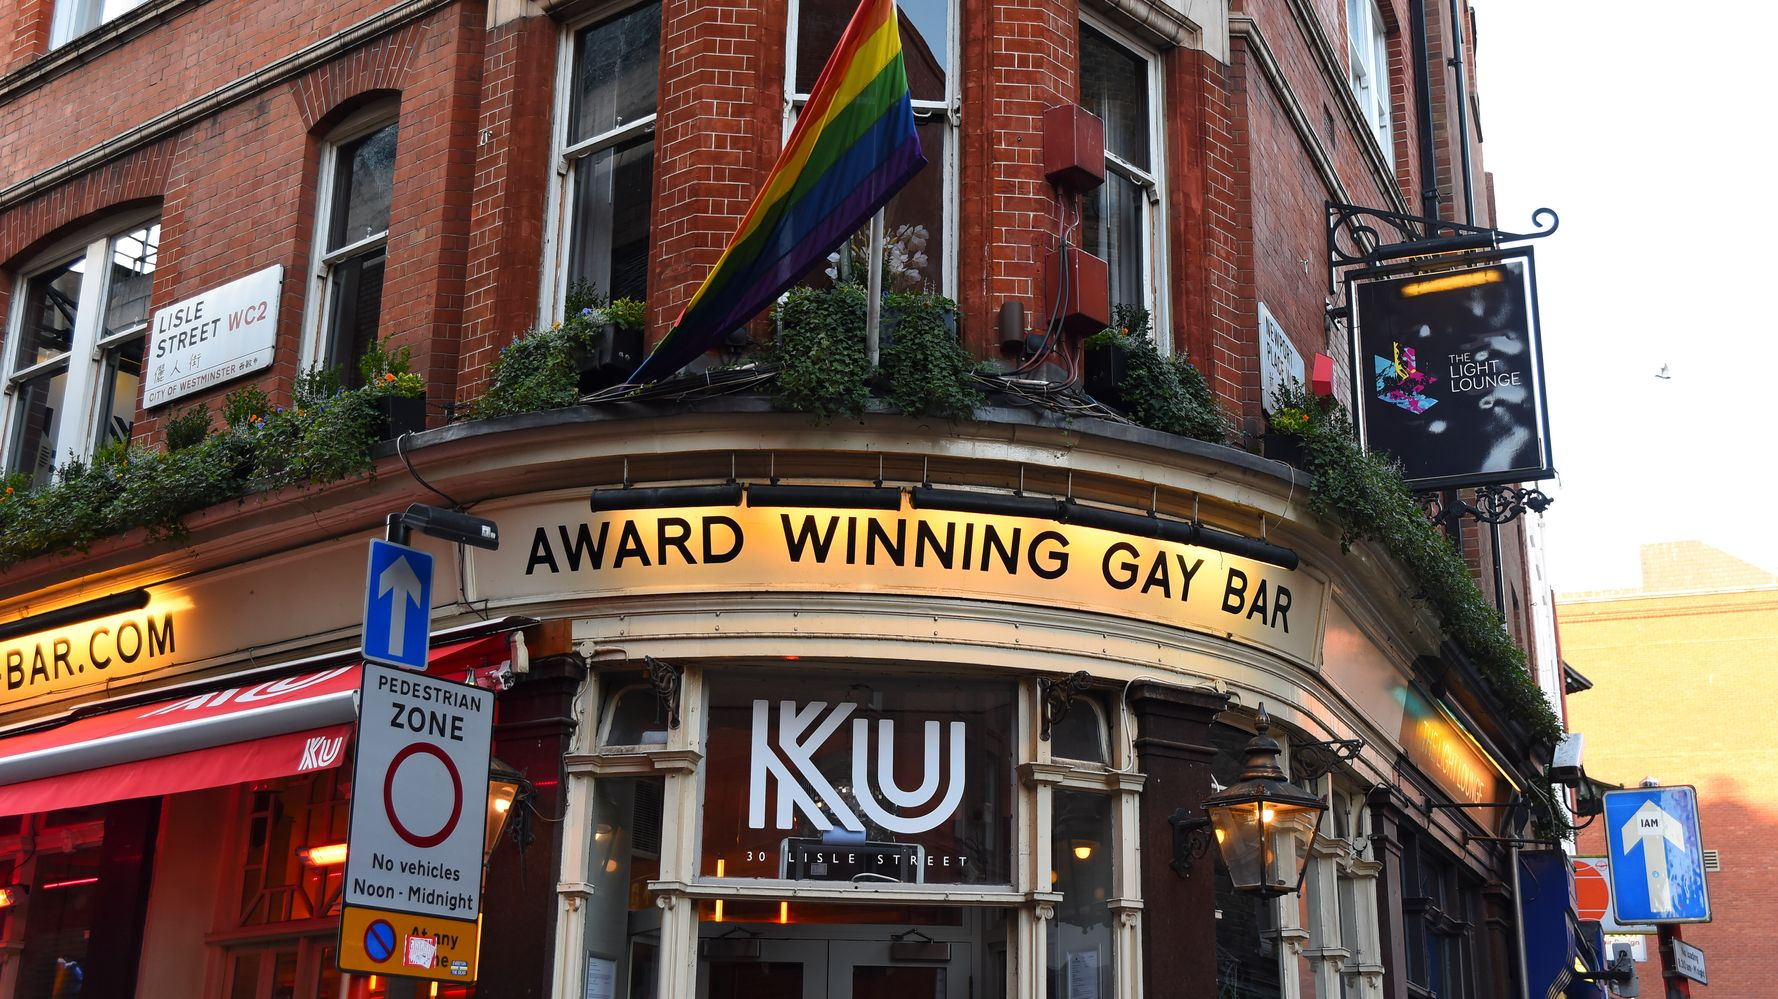 Gay Bars Around The World Facing Collapse Amid Coronavirus Pandemic